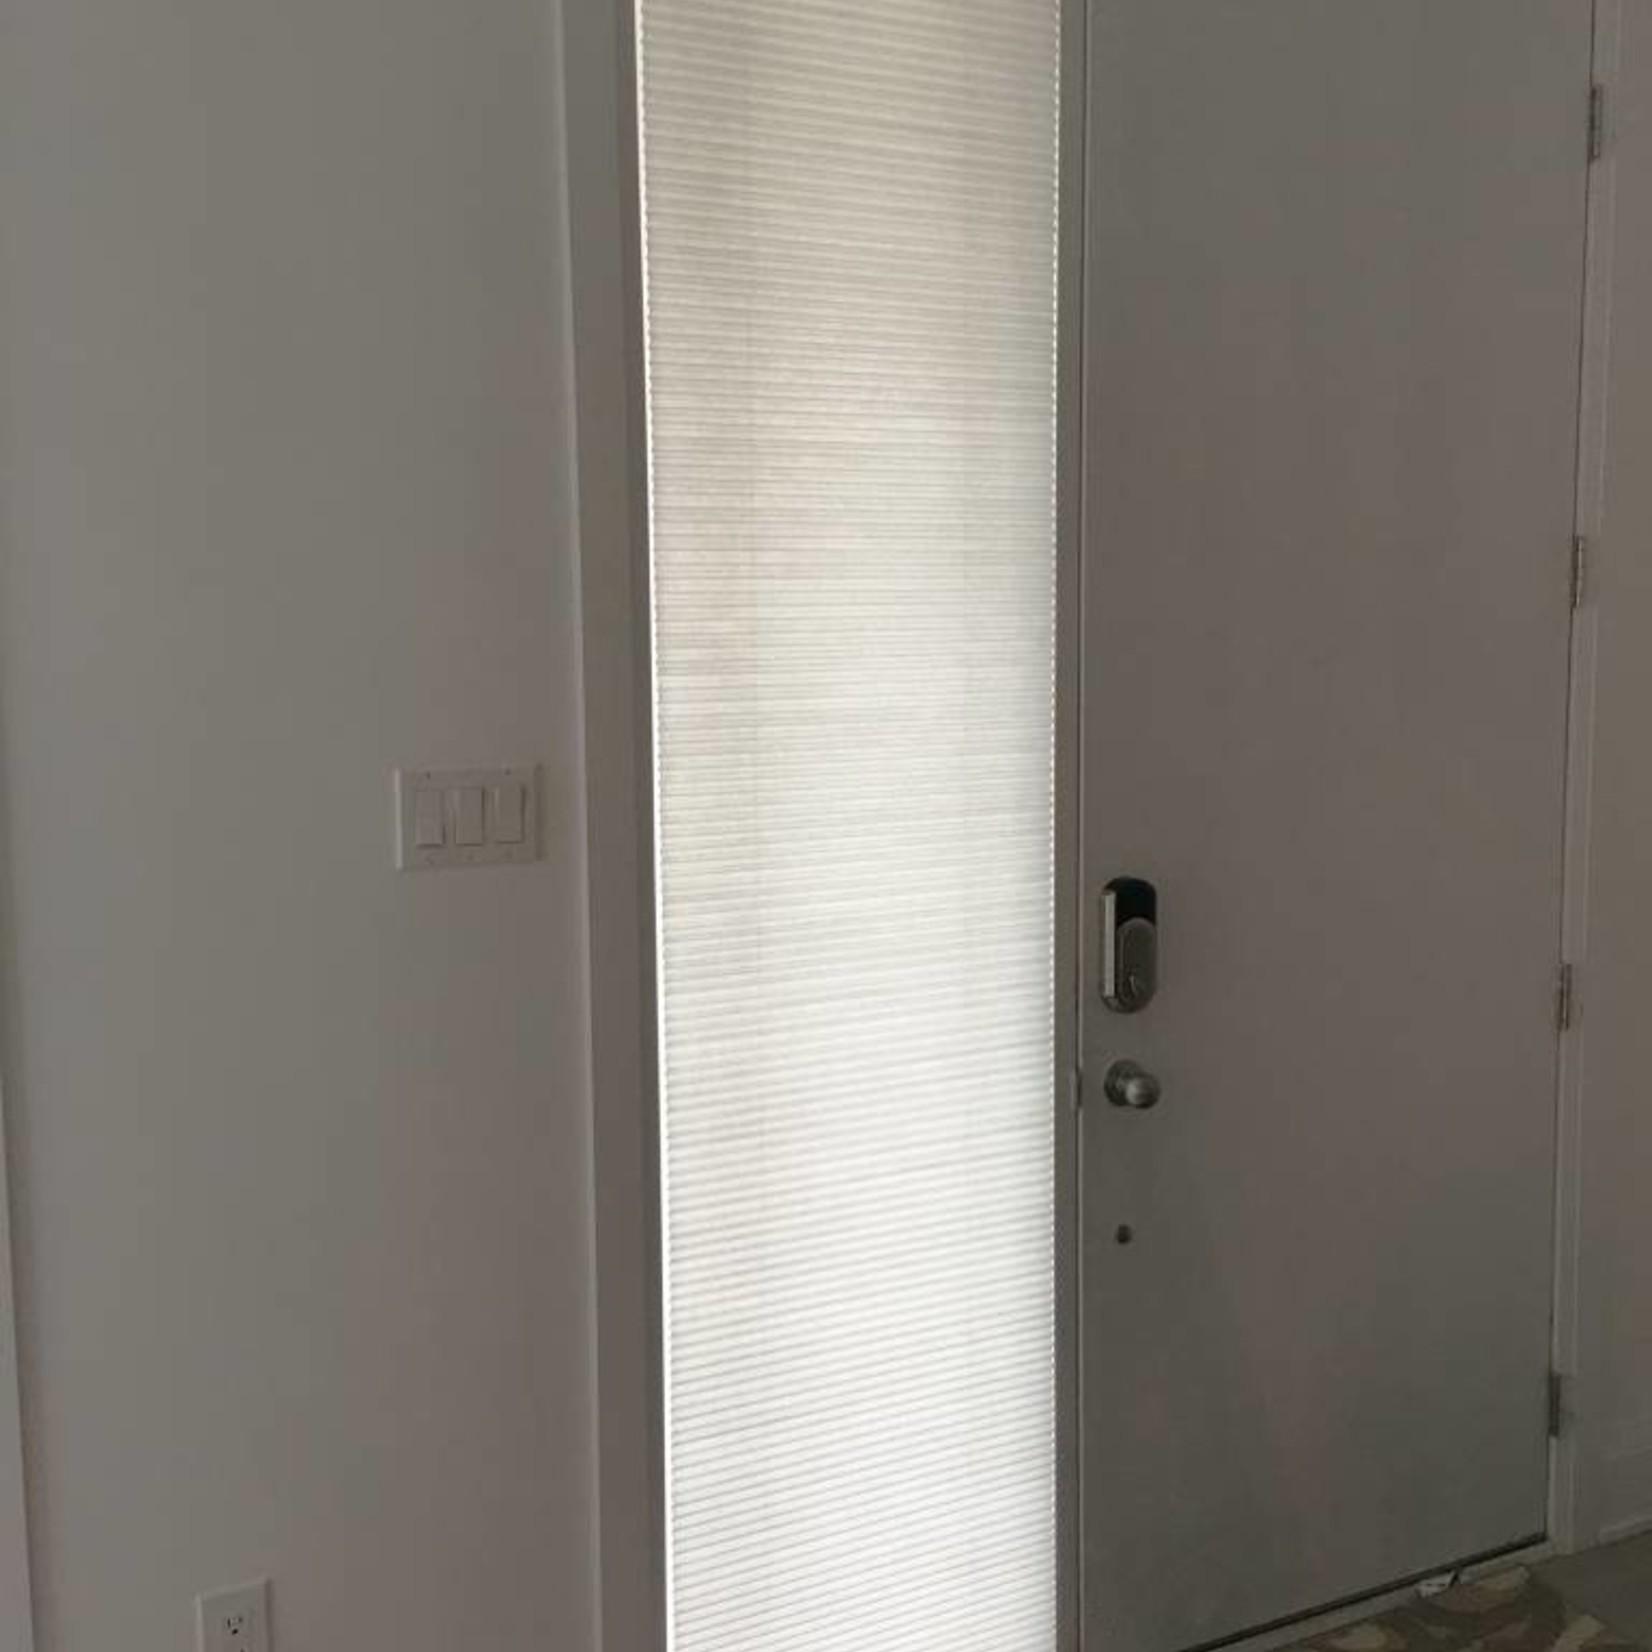 Trendy Blinds - MT Honeycomb Semi-Opaque